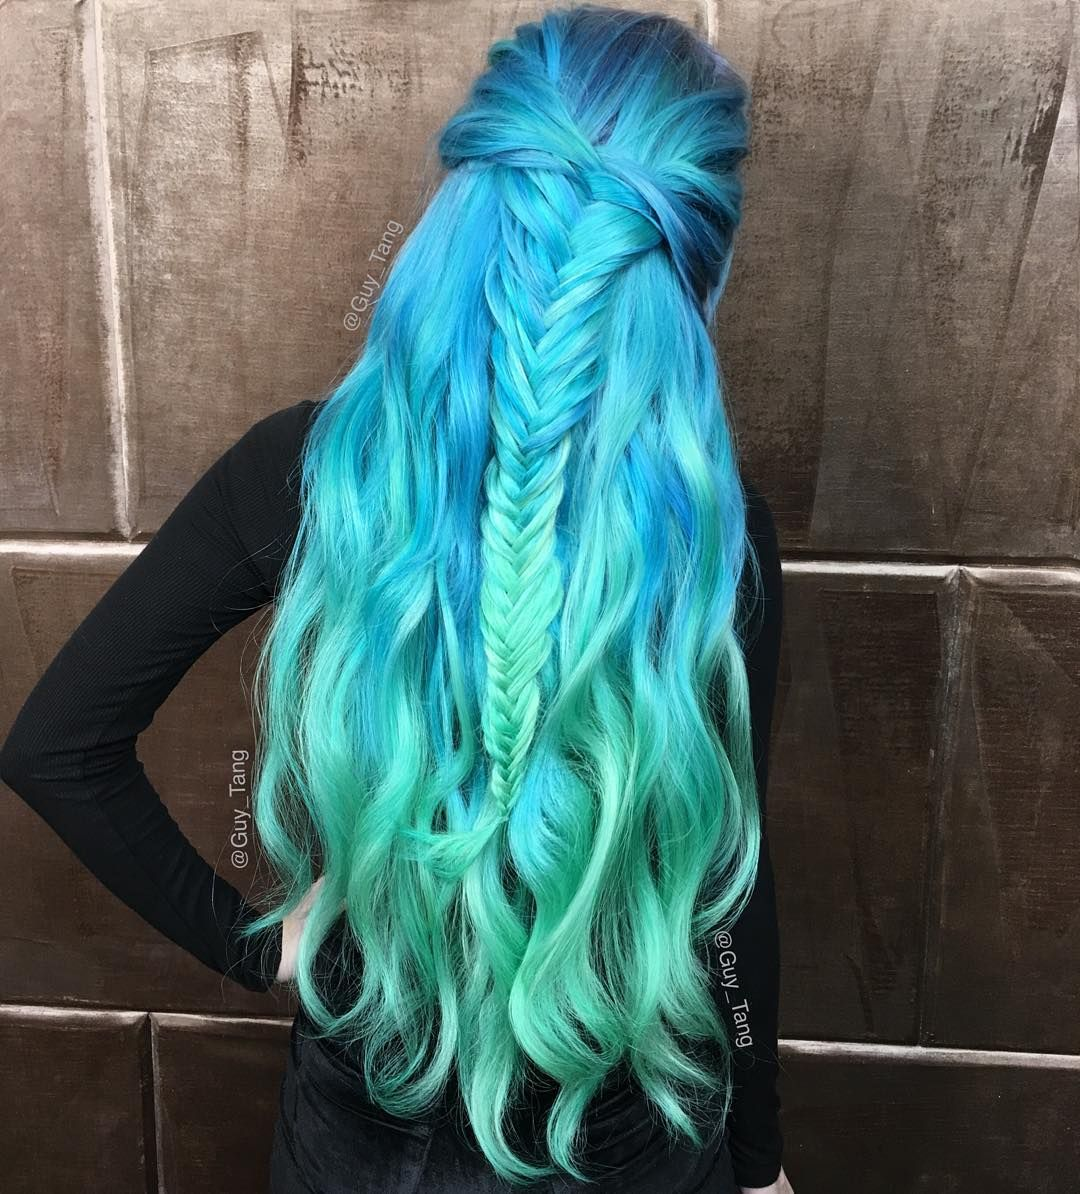 wavy mermaid teal blue & aquamarine